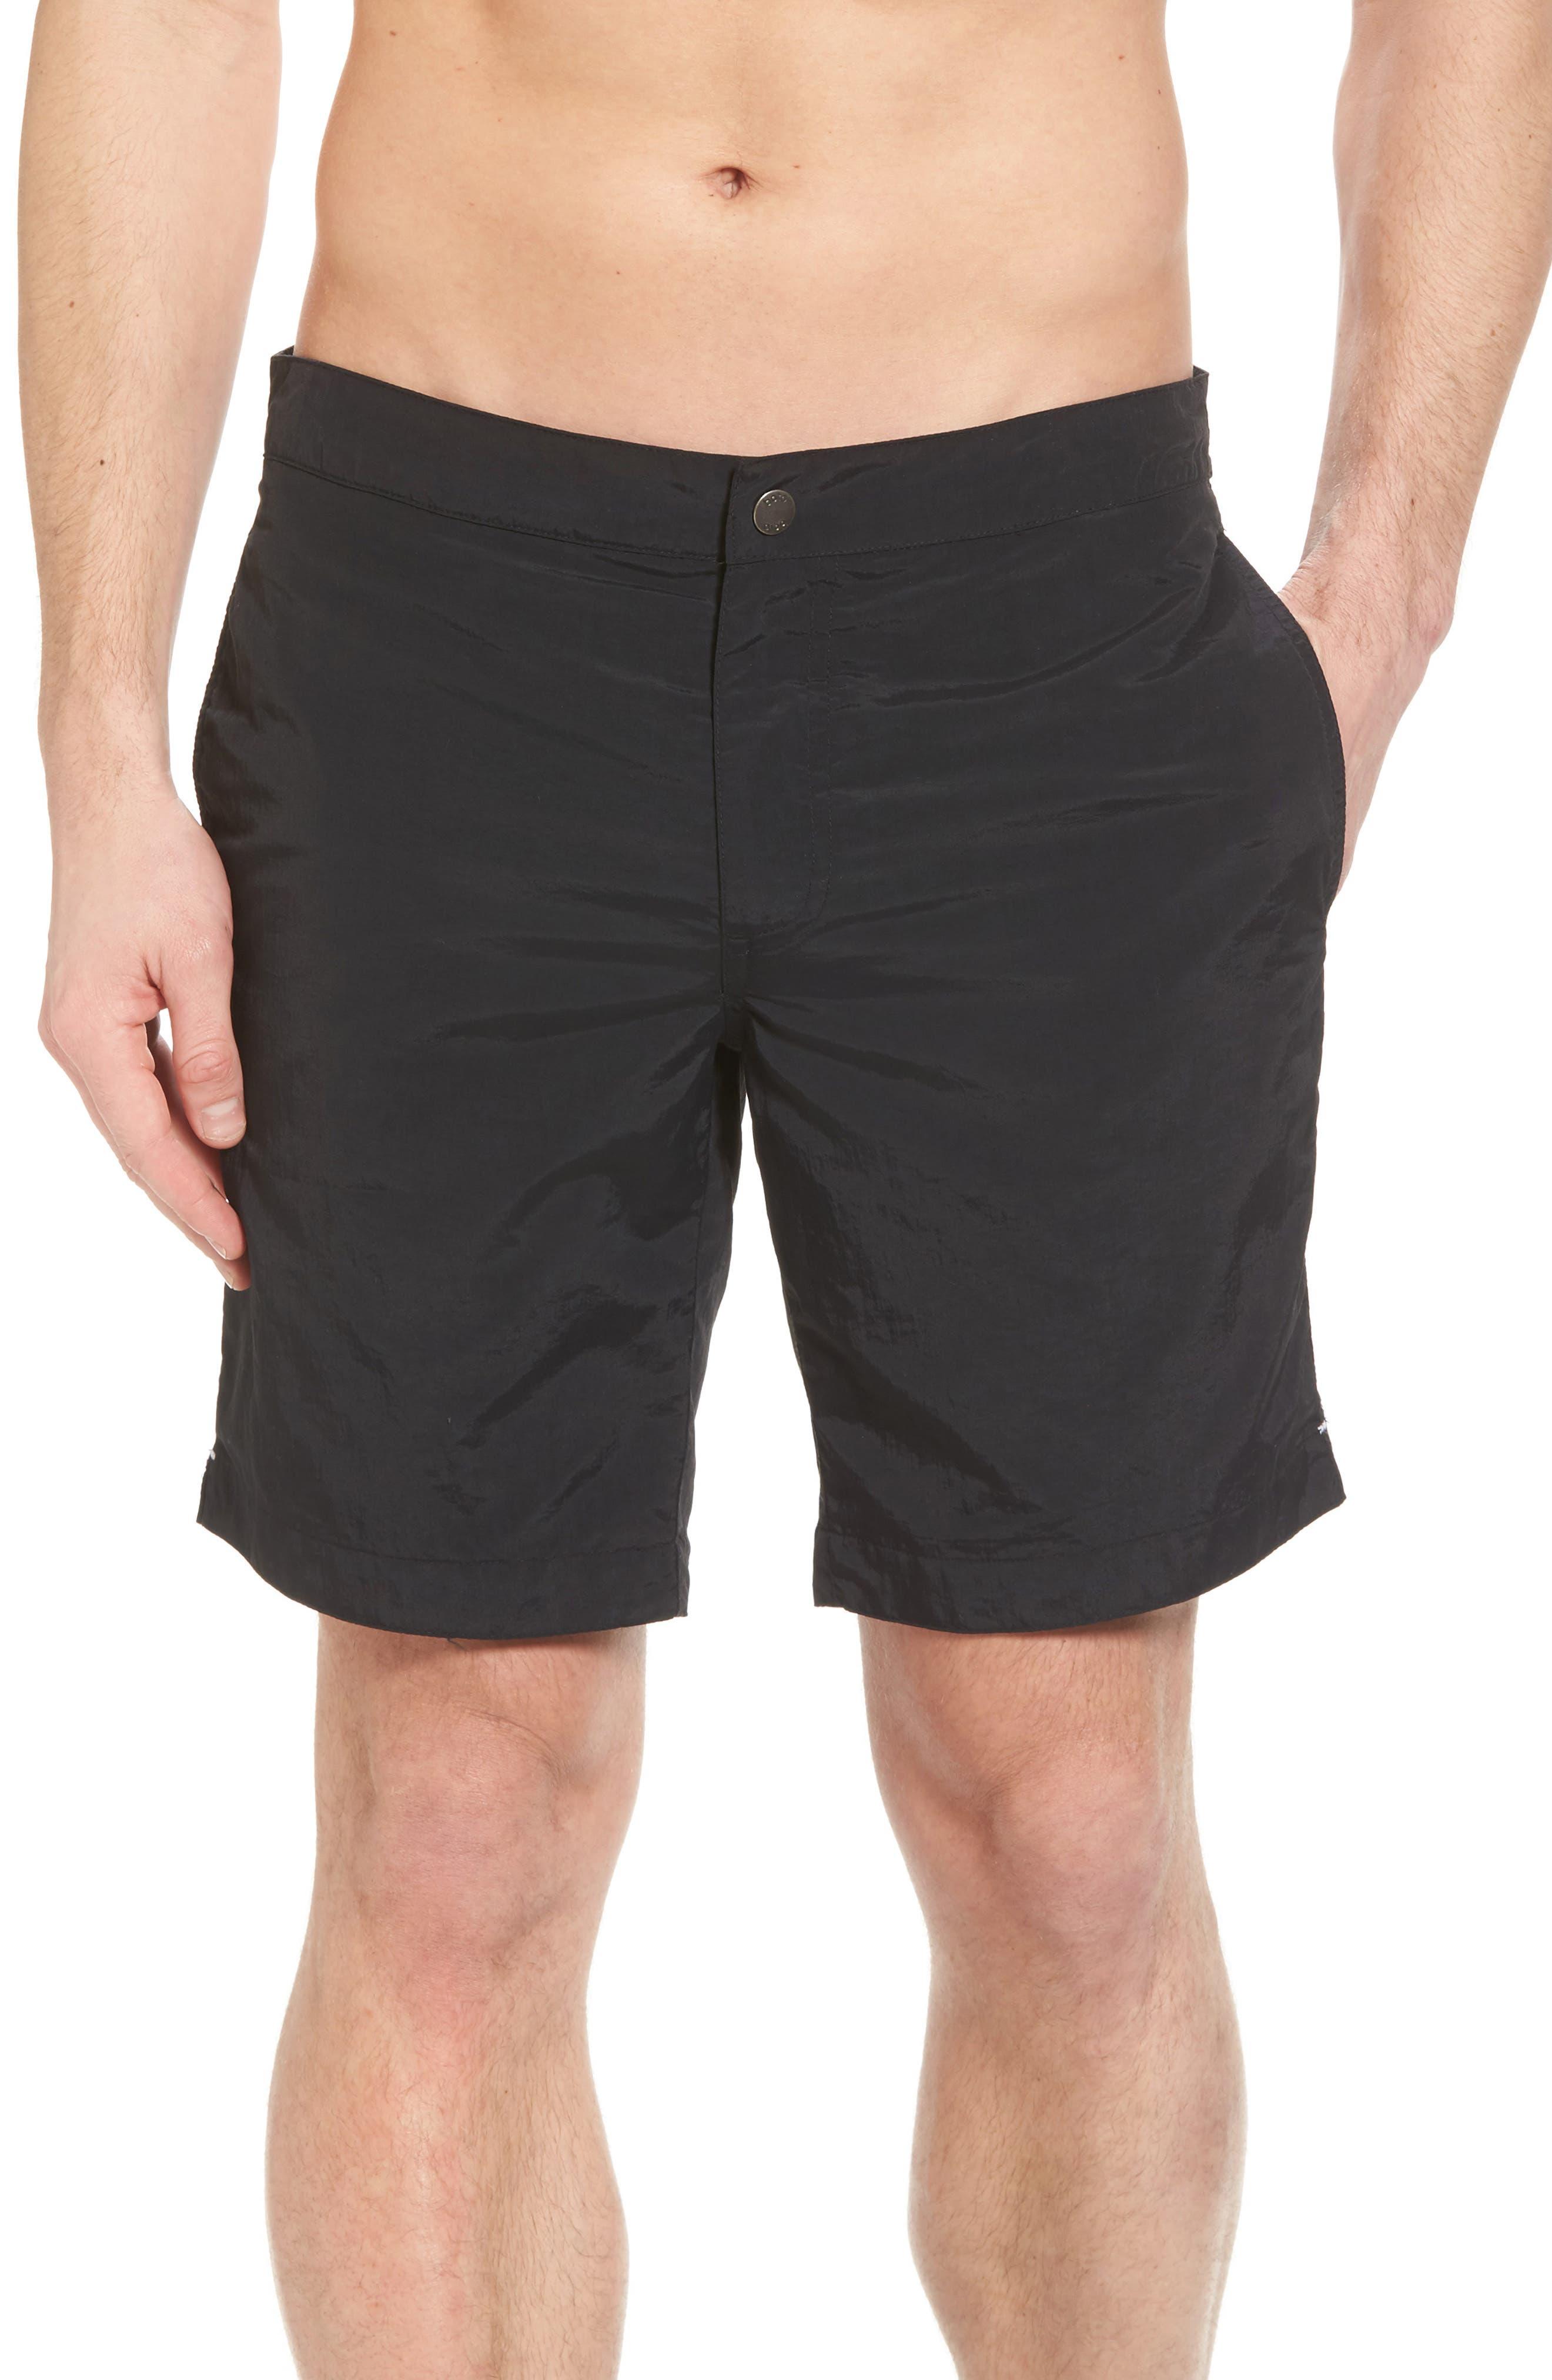 'Aruba - Island' Tailored Fit 8.5 Inch Board Shorts,                         Main,                         color,